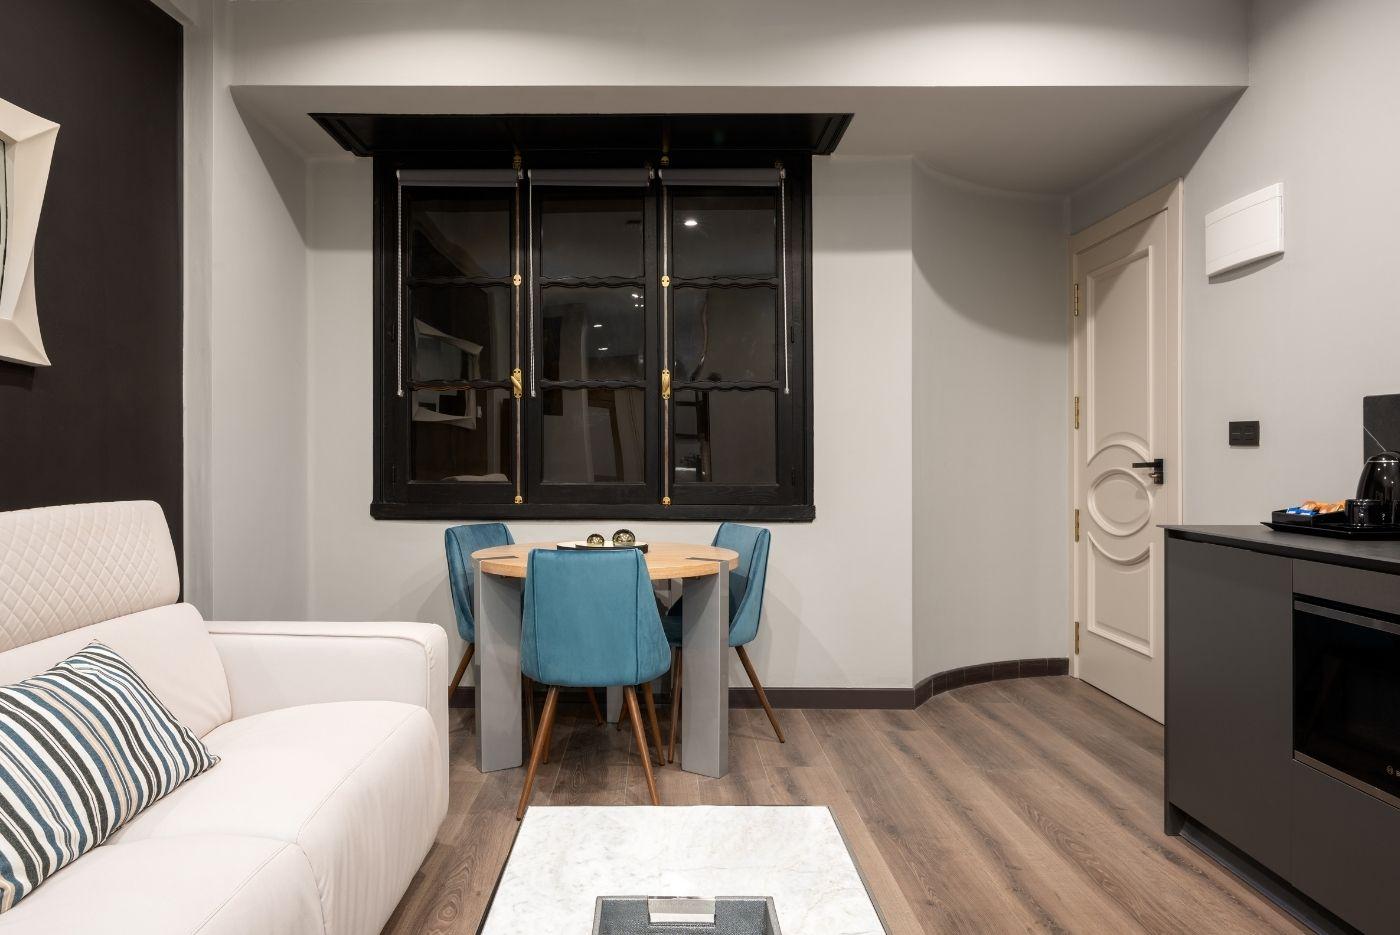 Apartamento-Suite-Deluxe-63-Oviedo-1907-02